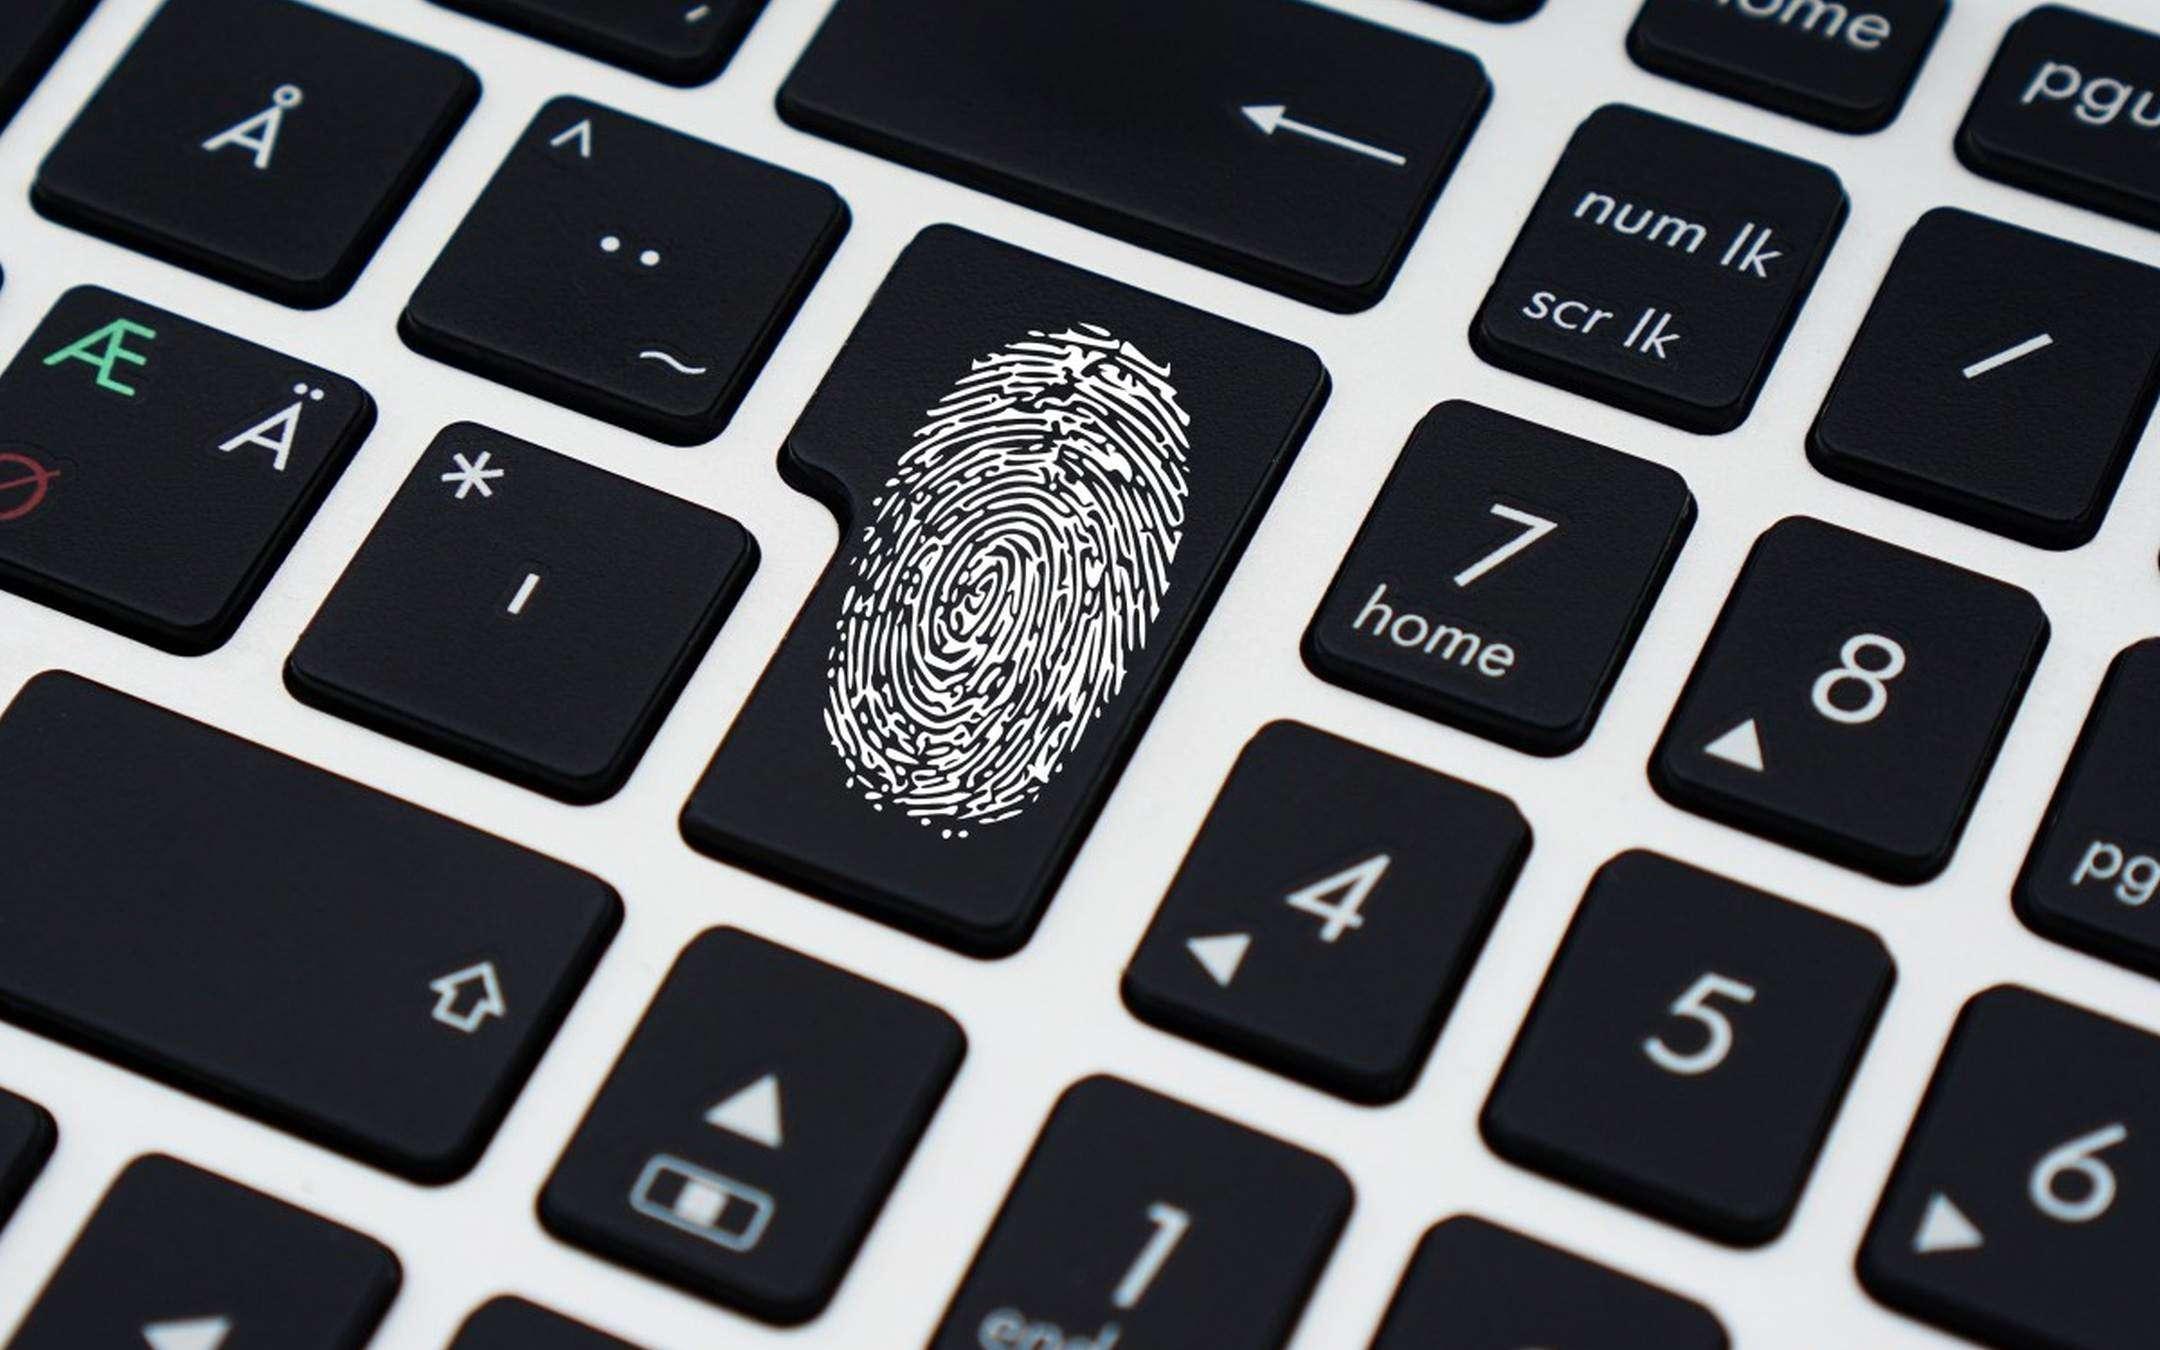 WhatsApp, biometric authentication on desktop